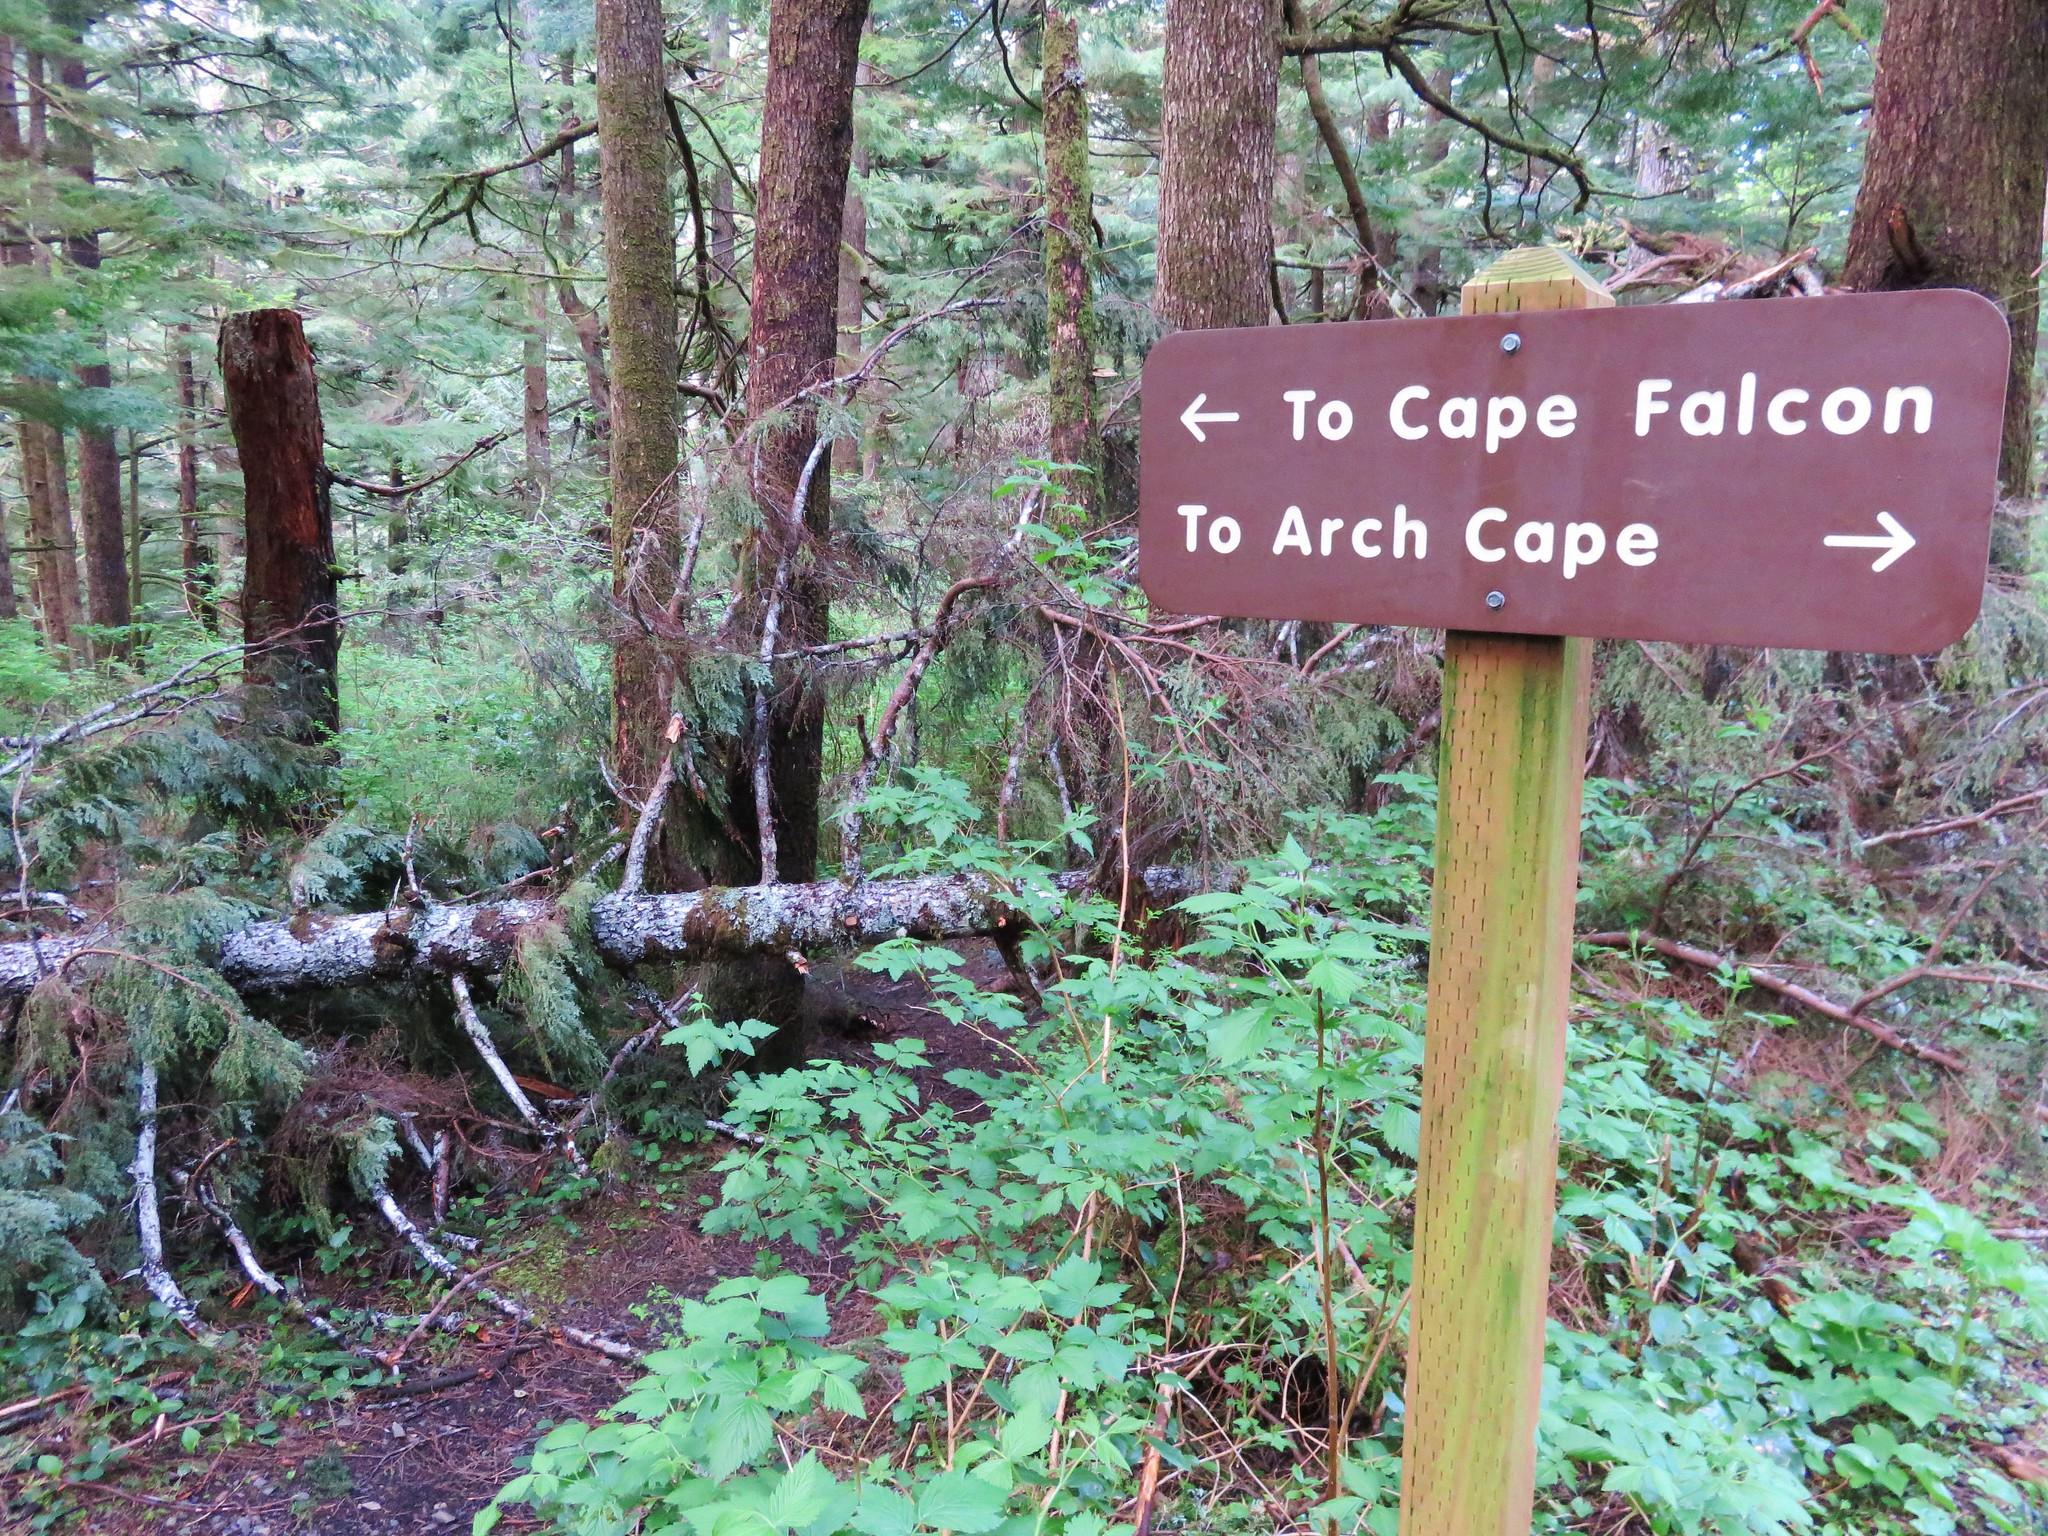 Oregon Coast Trail at Cape Falcon Road